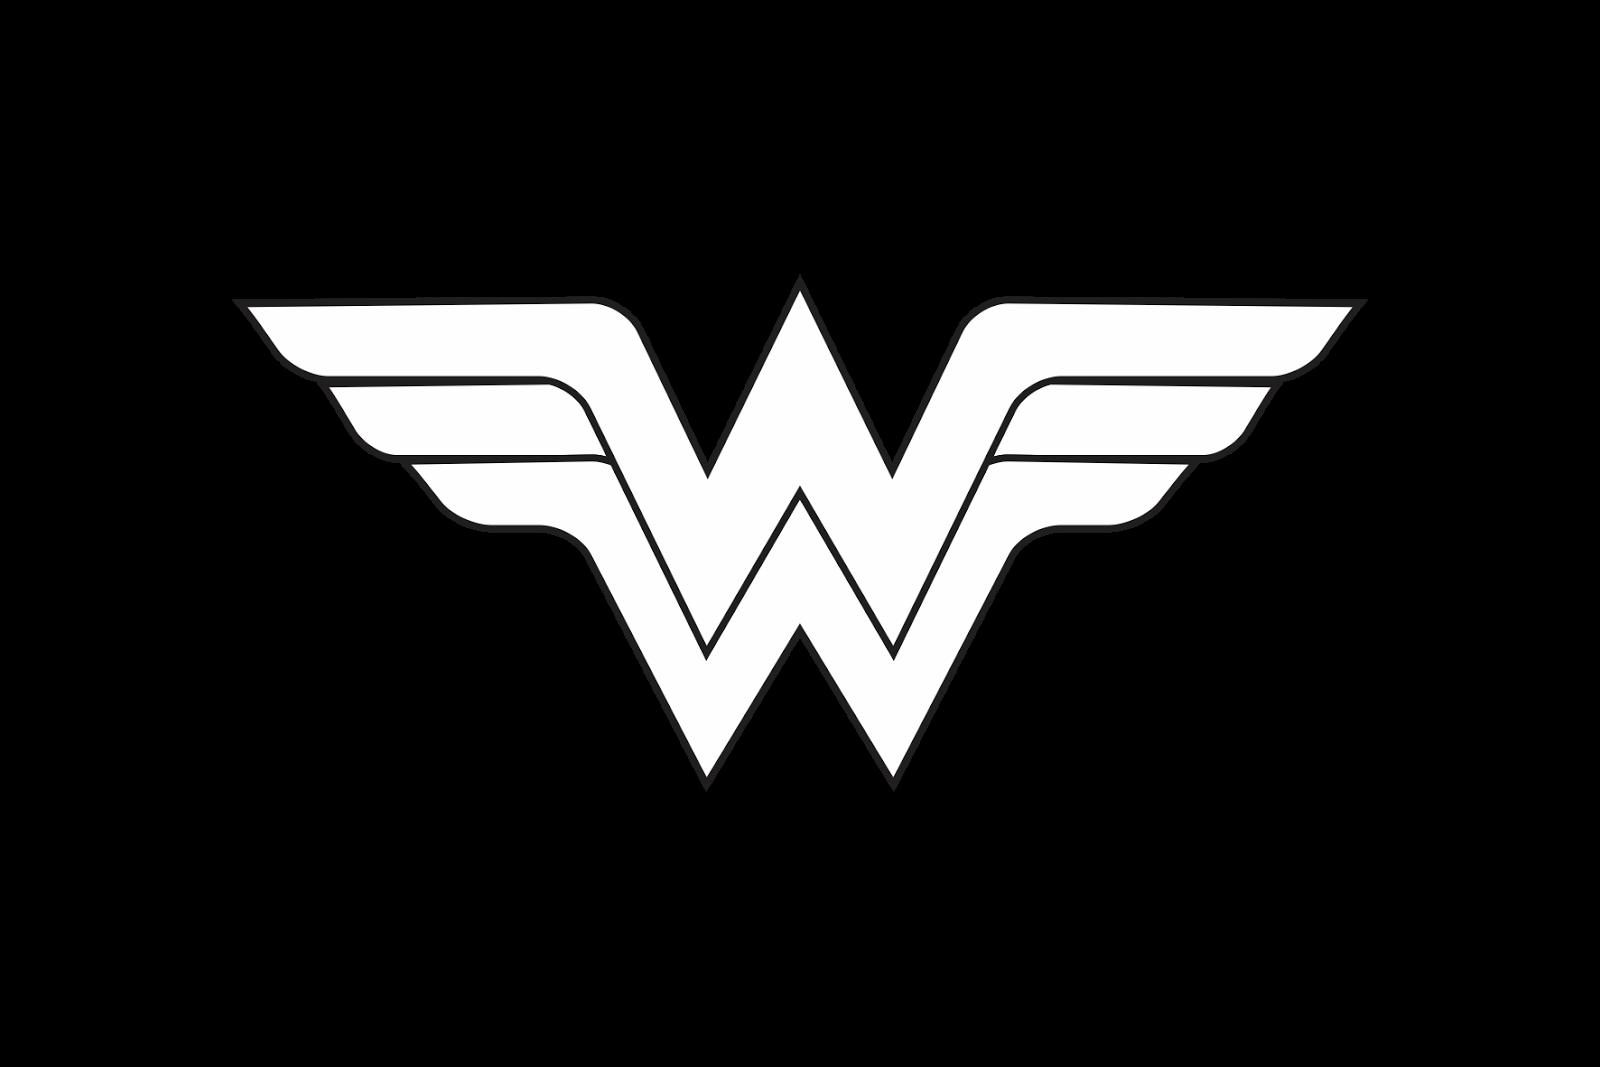 Wonder woman crown clipart black and white jpg free Wonder Woman Black And White Clipart #2167861 jpg free